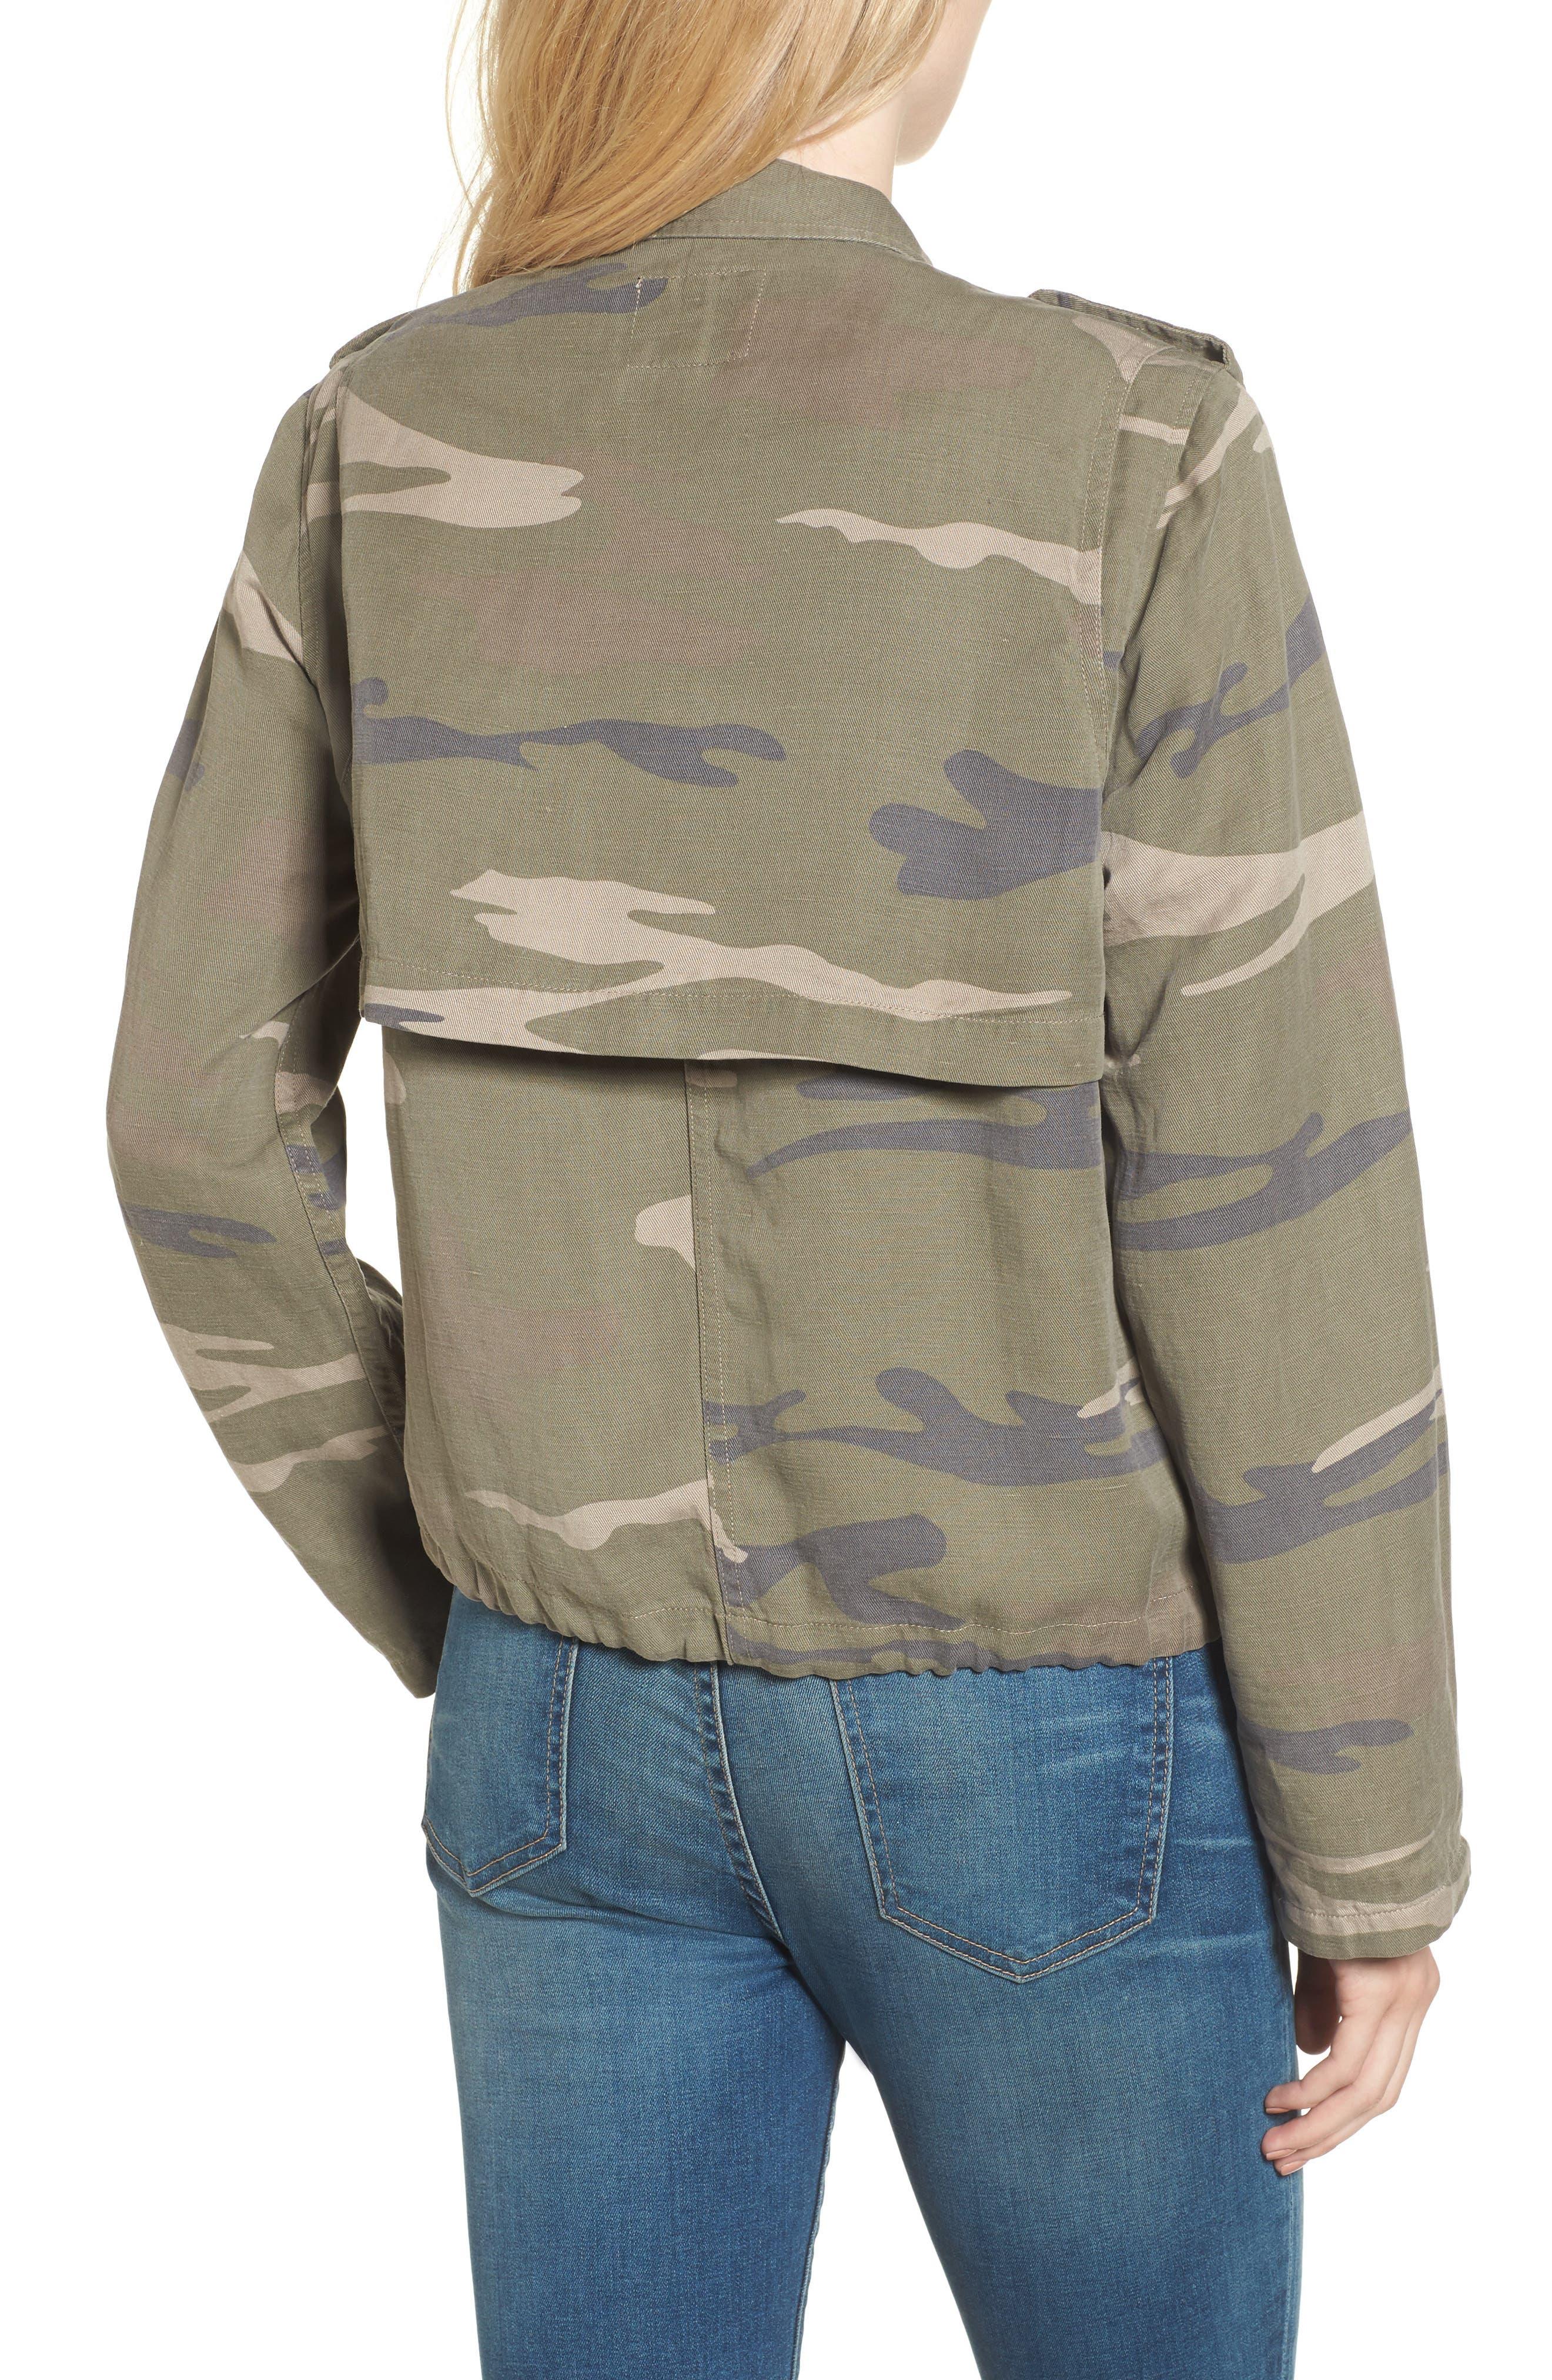 Maverick Camo Jacket,                             Alternate thumbnail 3, color,                             Sage Camo